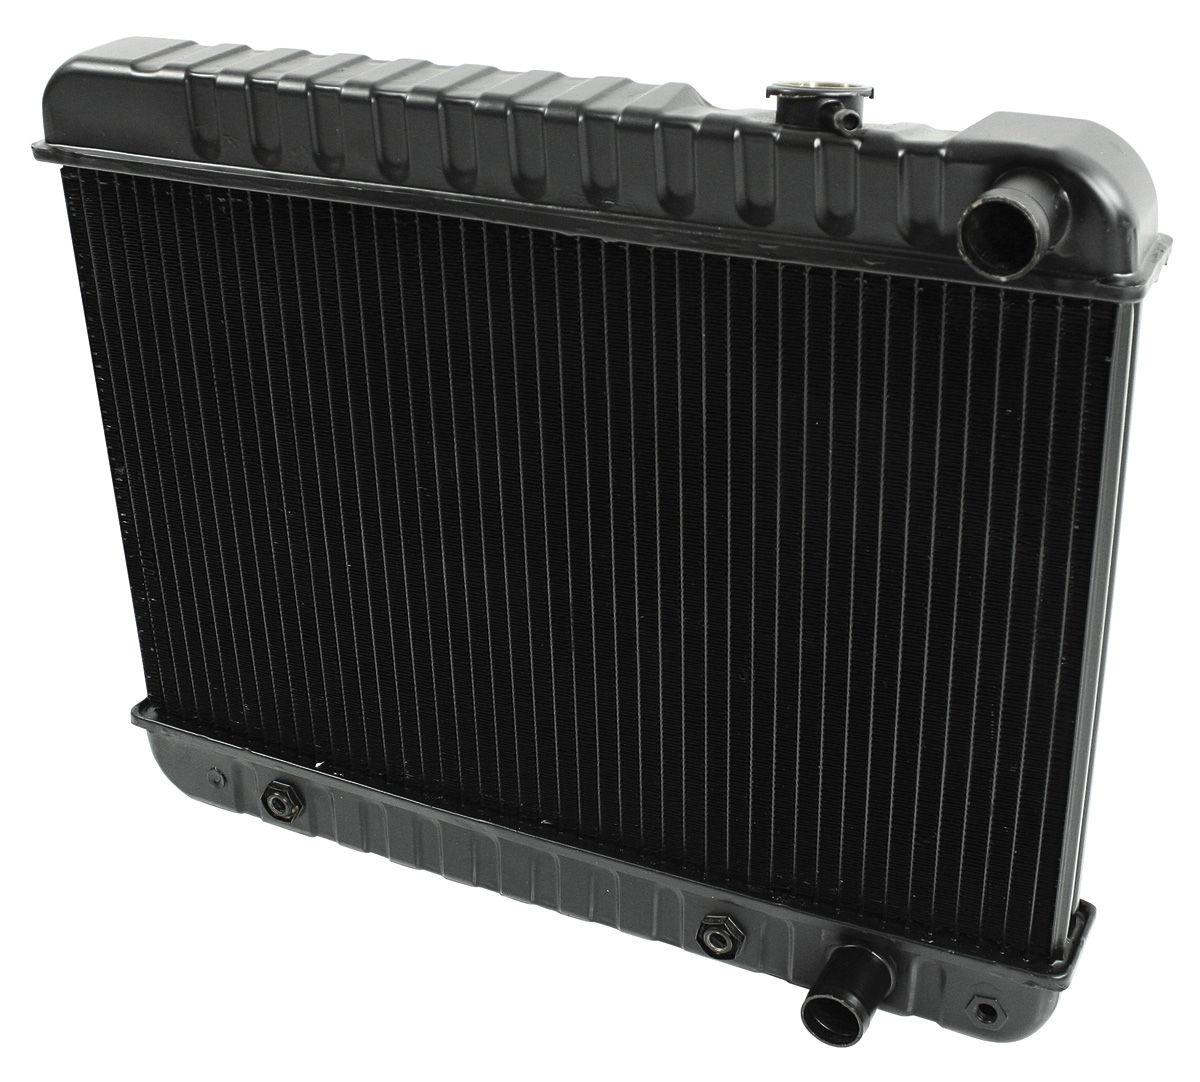 "Radiator, 1964-65 Skylark, 300 V8, Automatic, 3-Row, 15-5/8"" X 24-3/4"" X 2"""